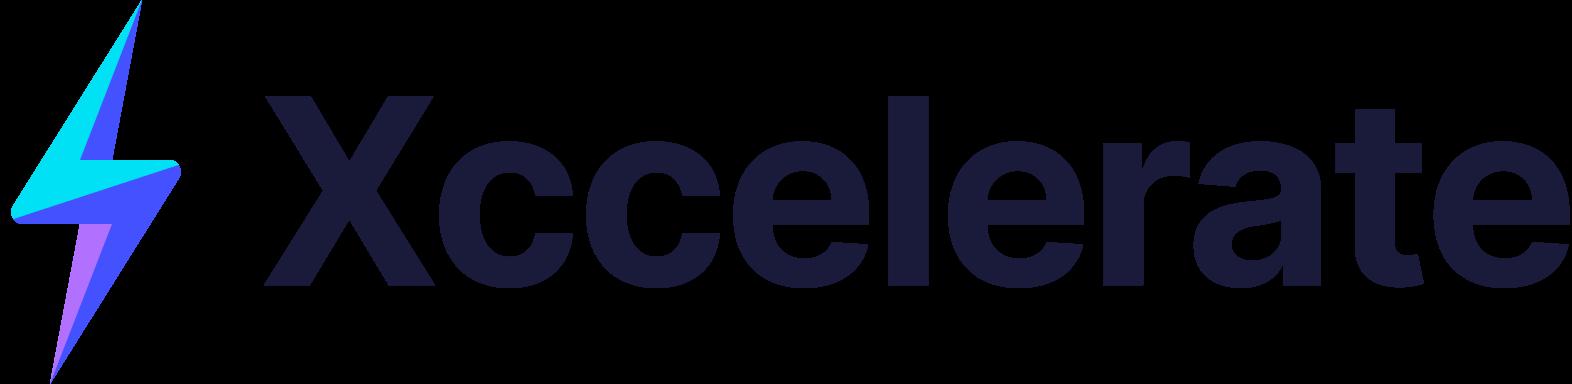 xccelerate-logo-light